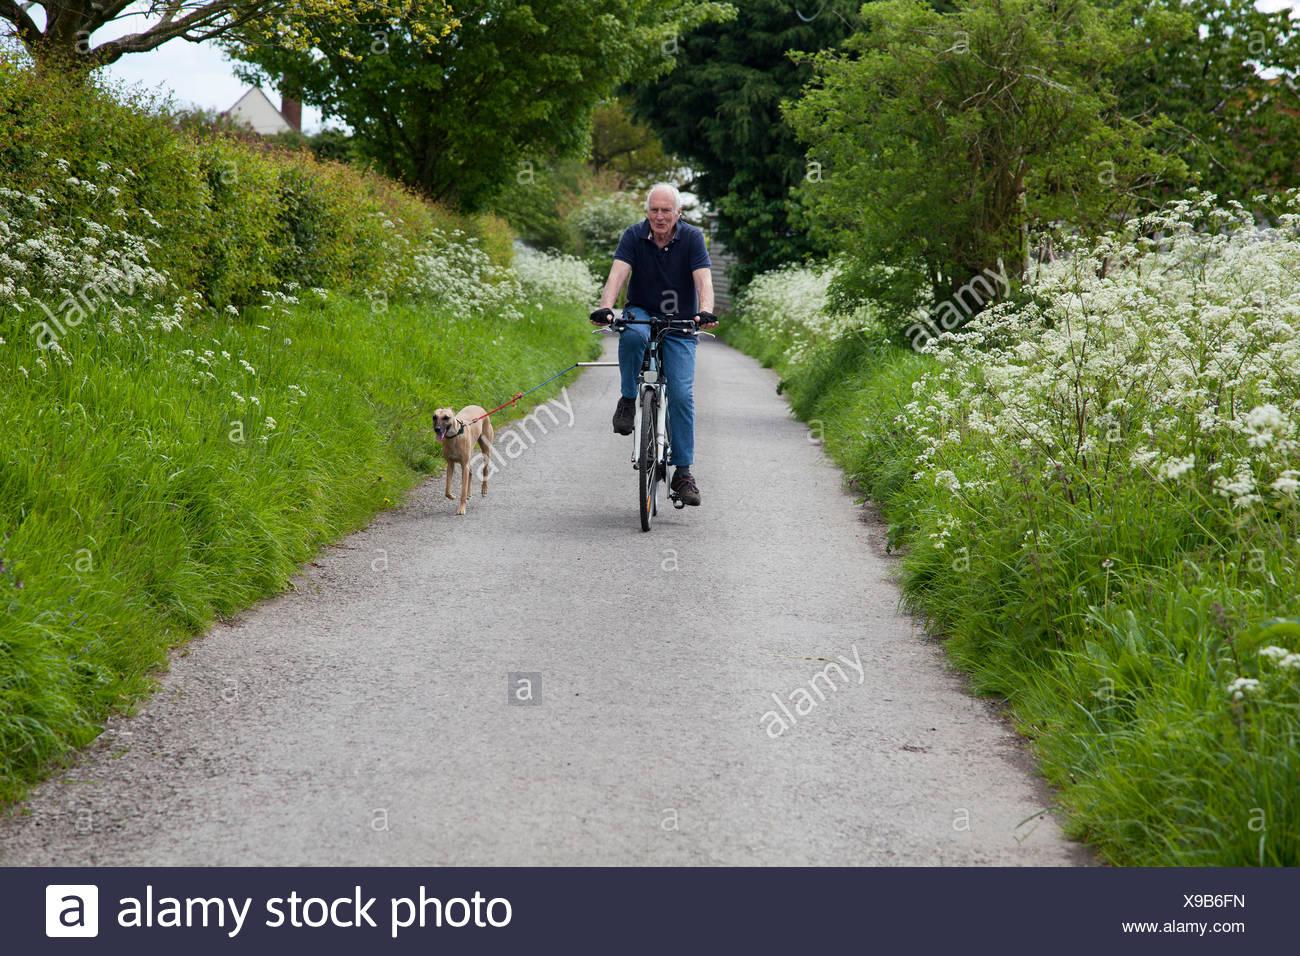 Senior man riding bike on country lane with dog - Stock Image